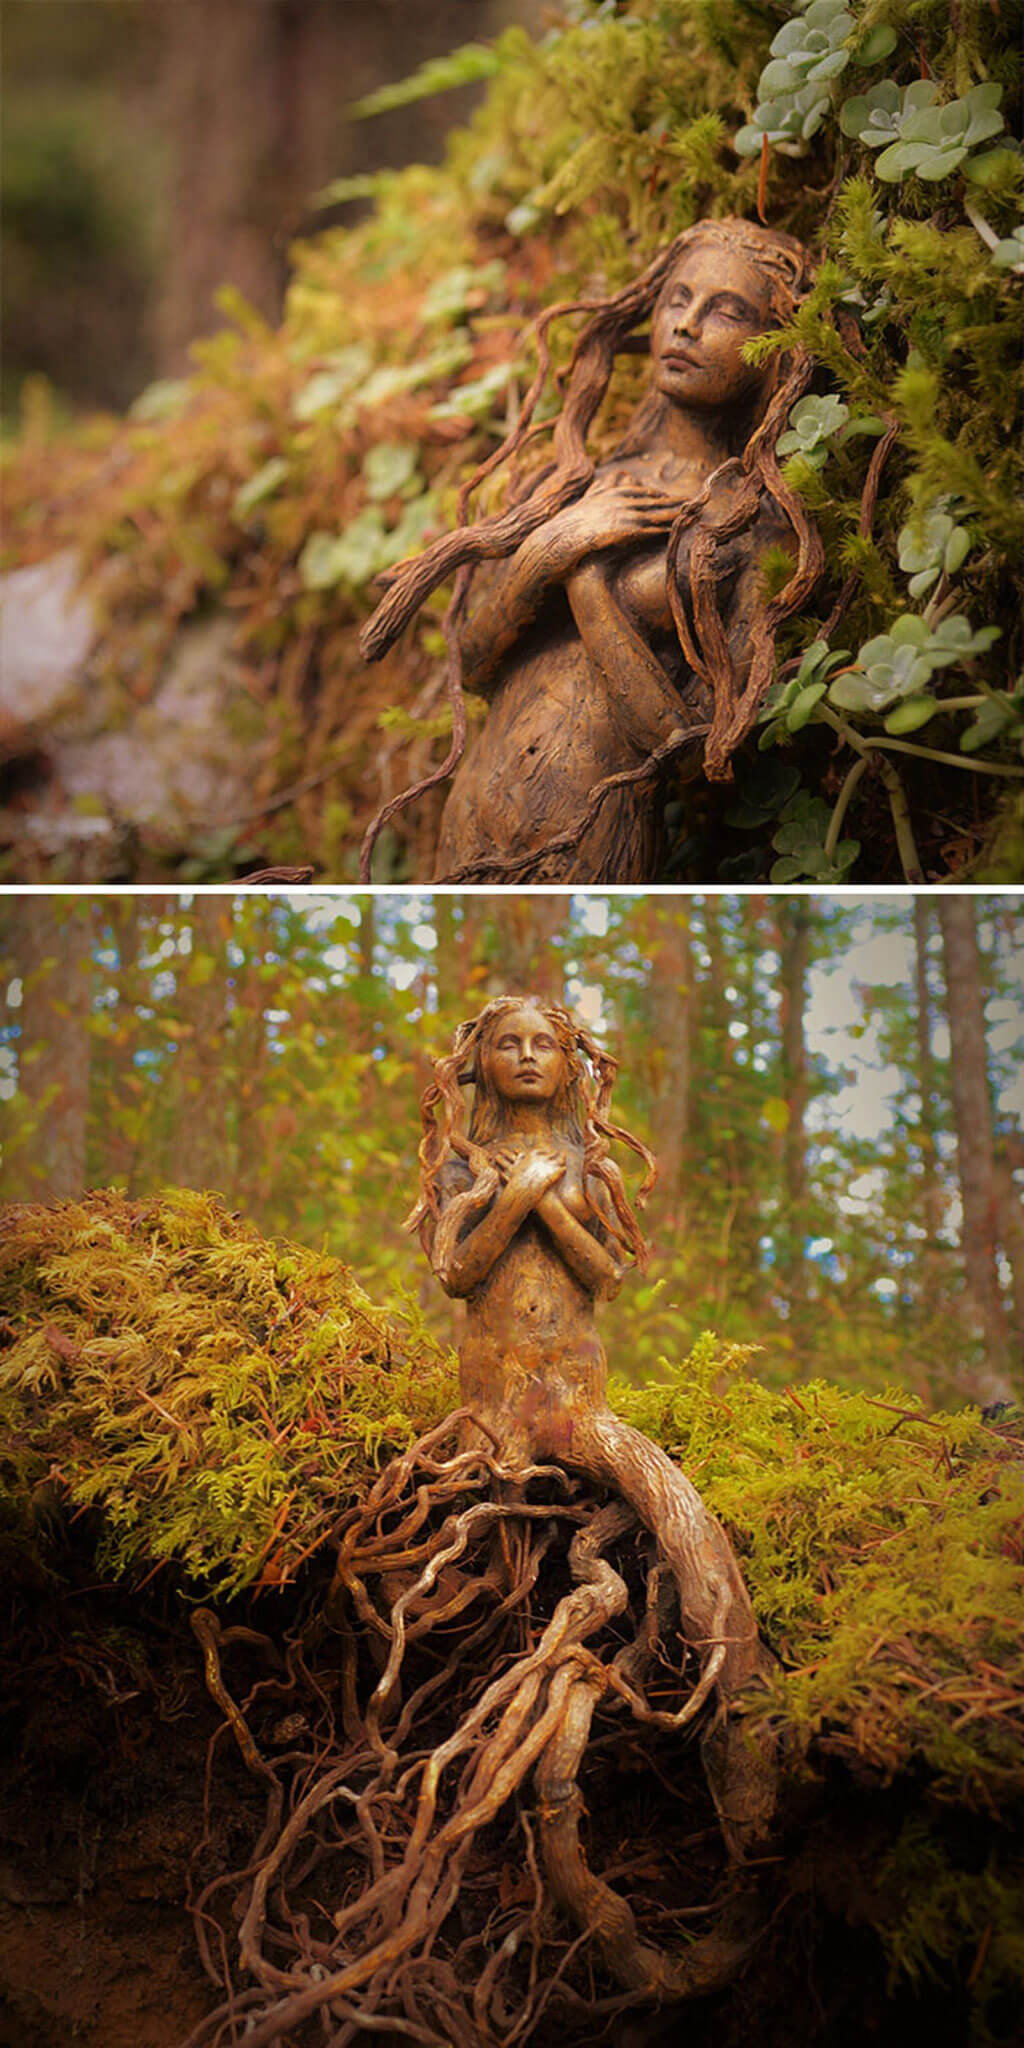 Nature-inspired sculptures by Debra Bernier